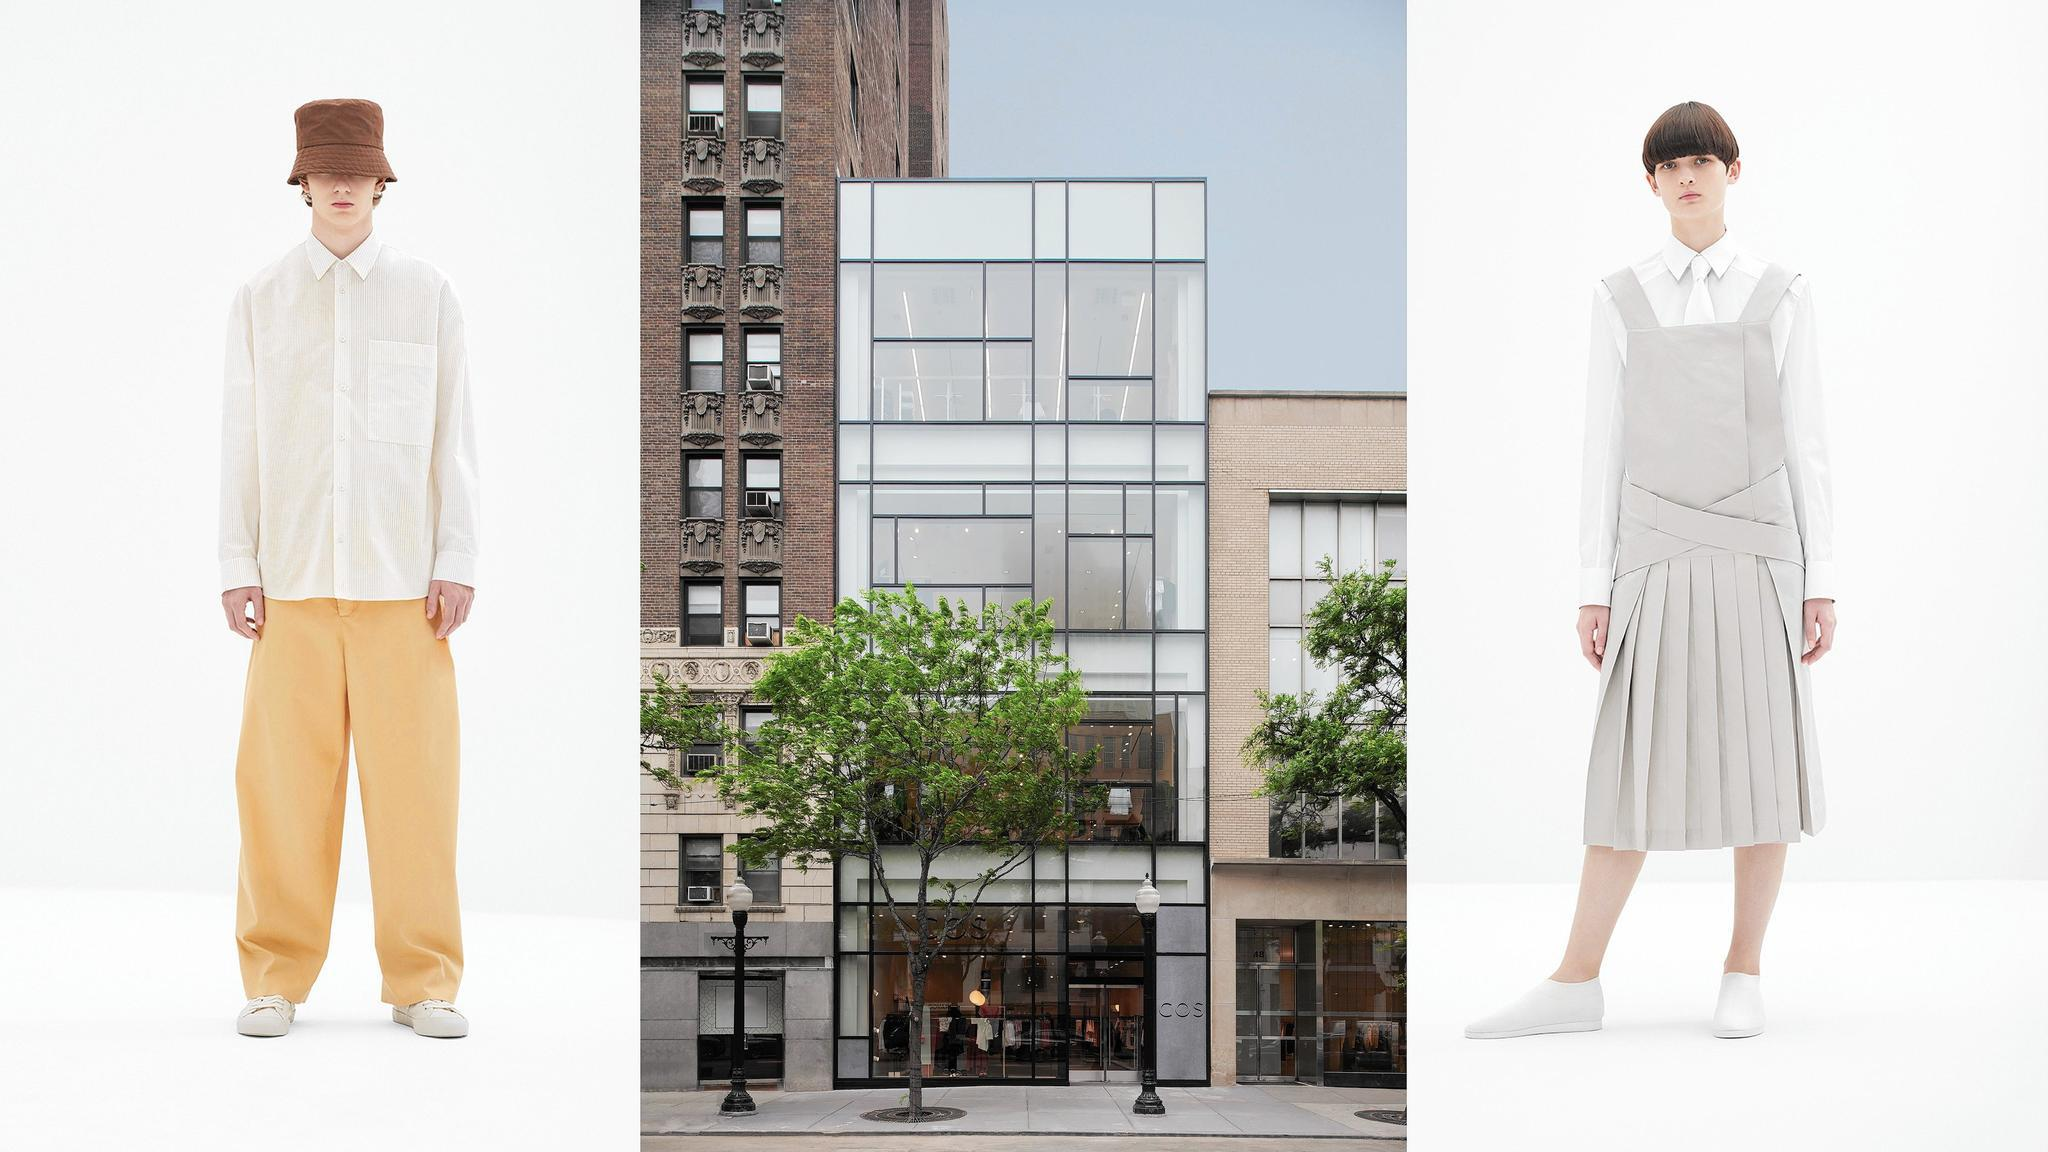 Cos Opens Mega Store On Oak Street Bringing Chic Affordable Style Chicago Tribune